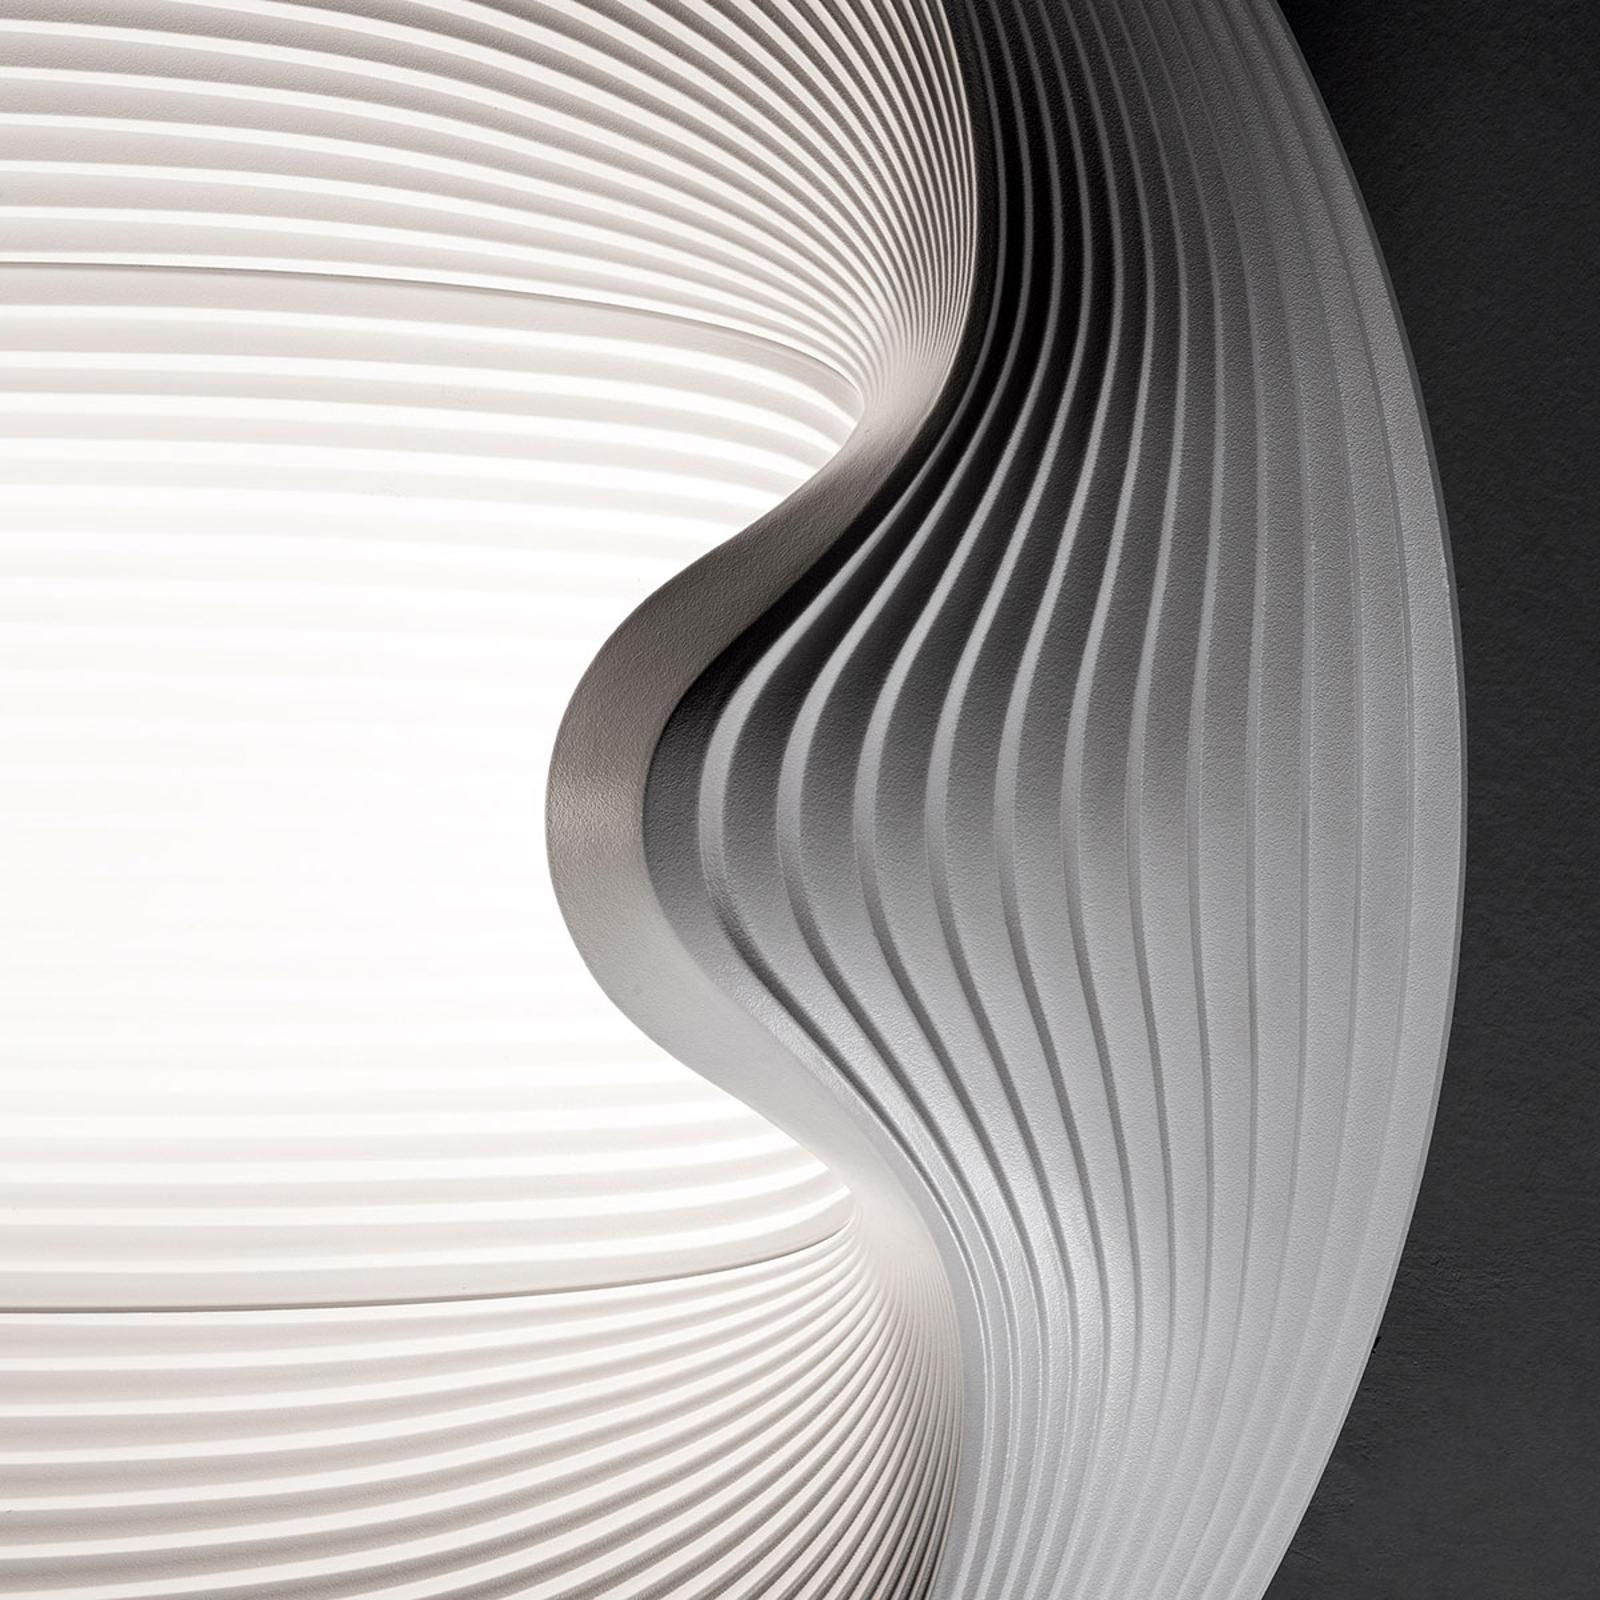 Cini&Nils Sestessa LED-Deckenleuchte Casambi-fähig